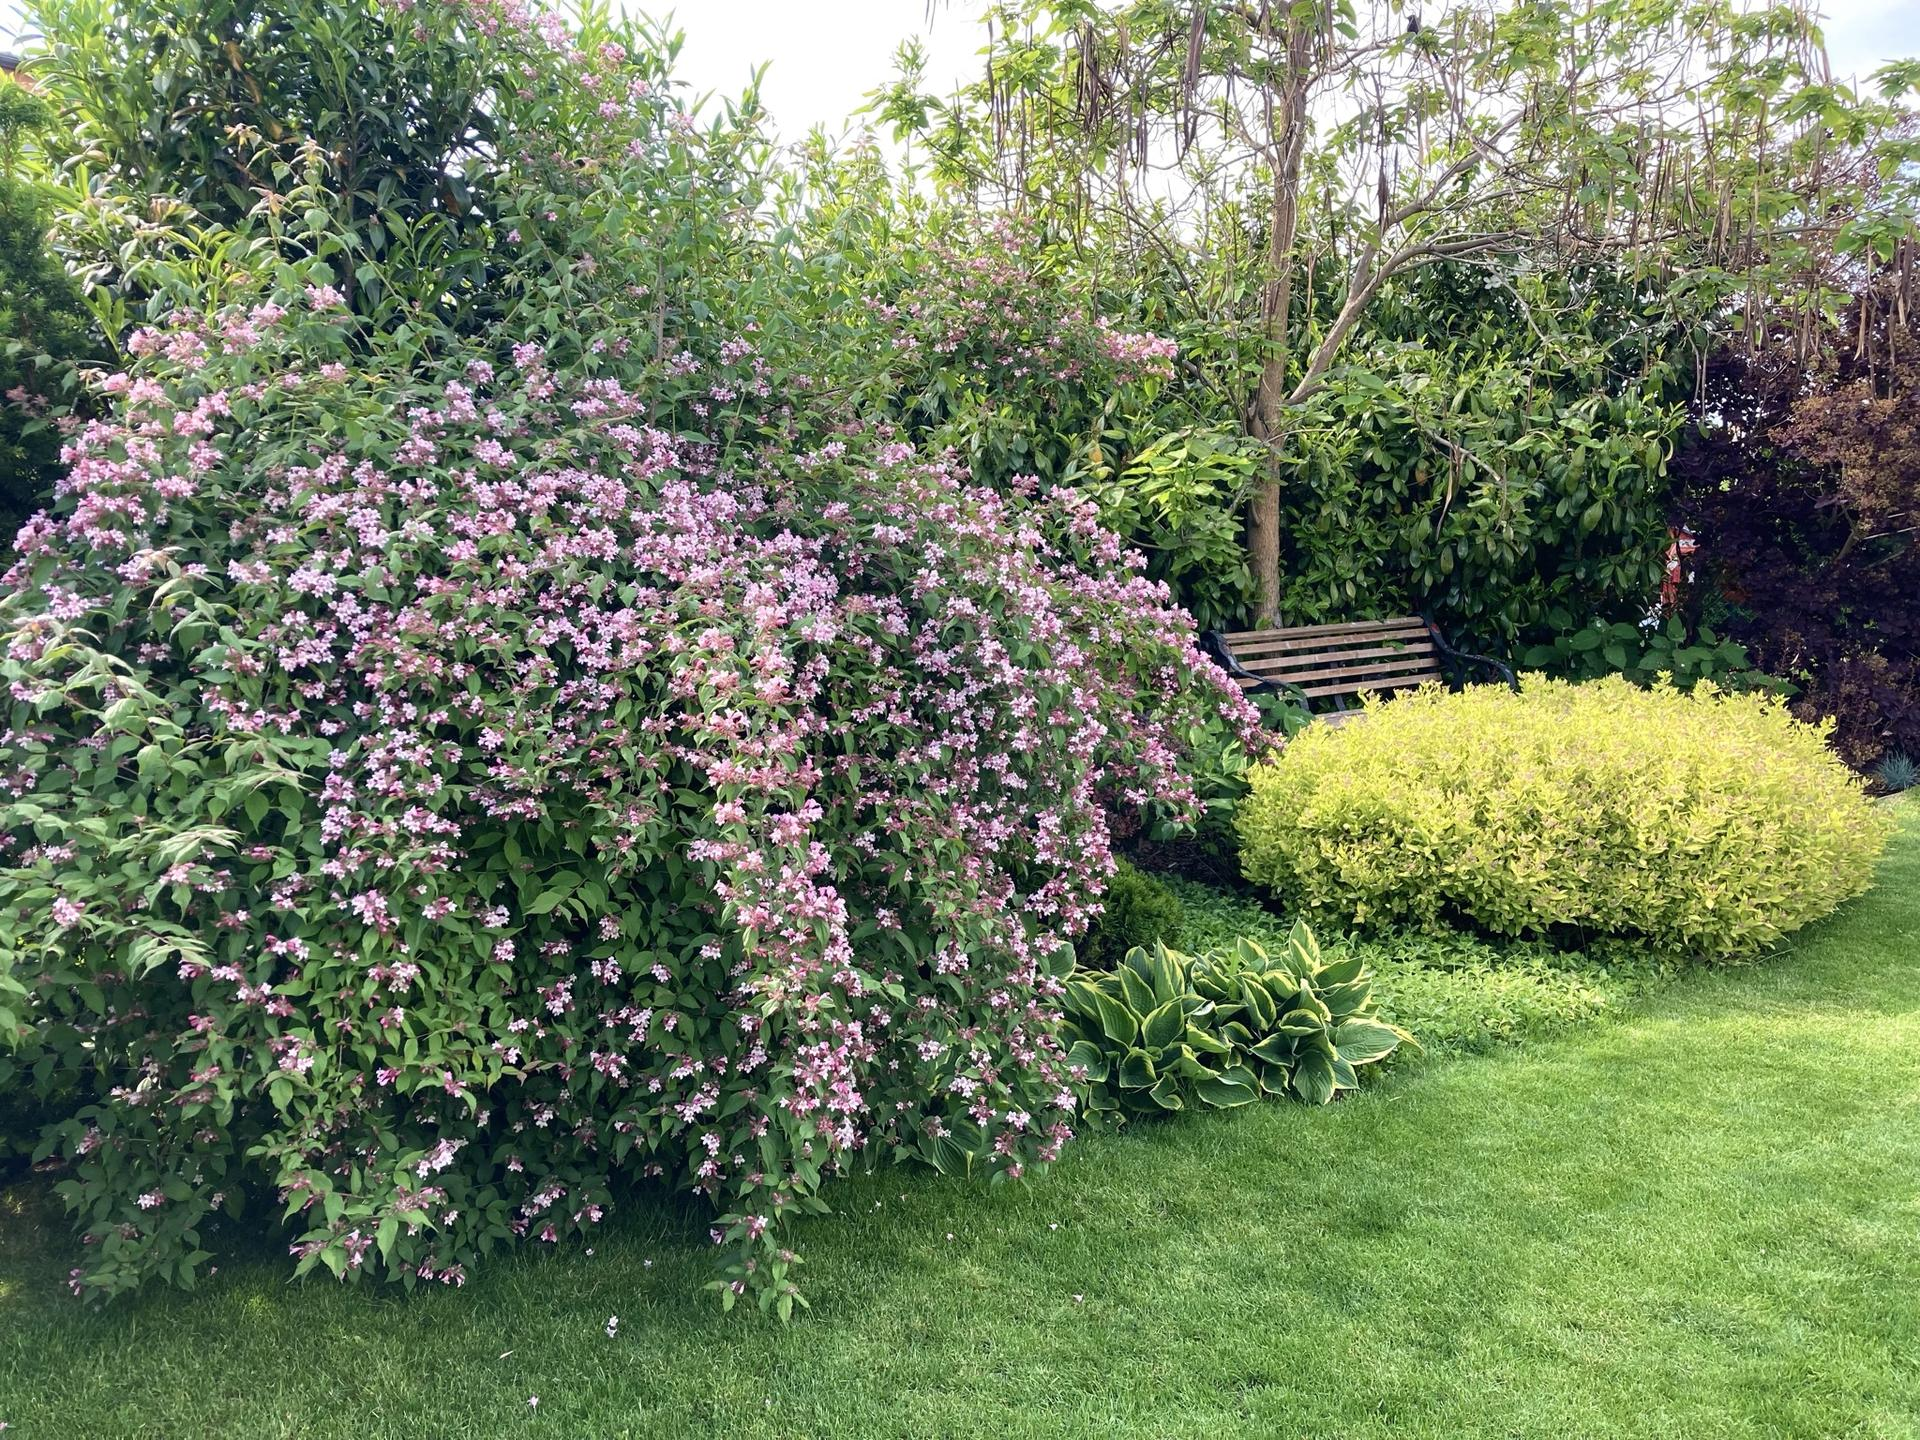 Zahrada 2021 - Kolkwicie krasna v kvetu